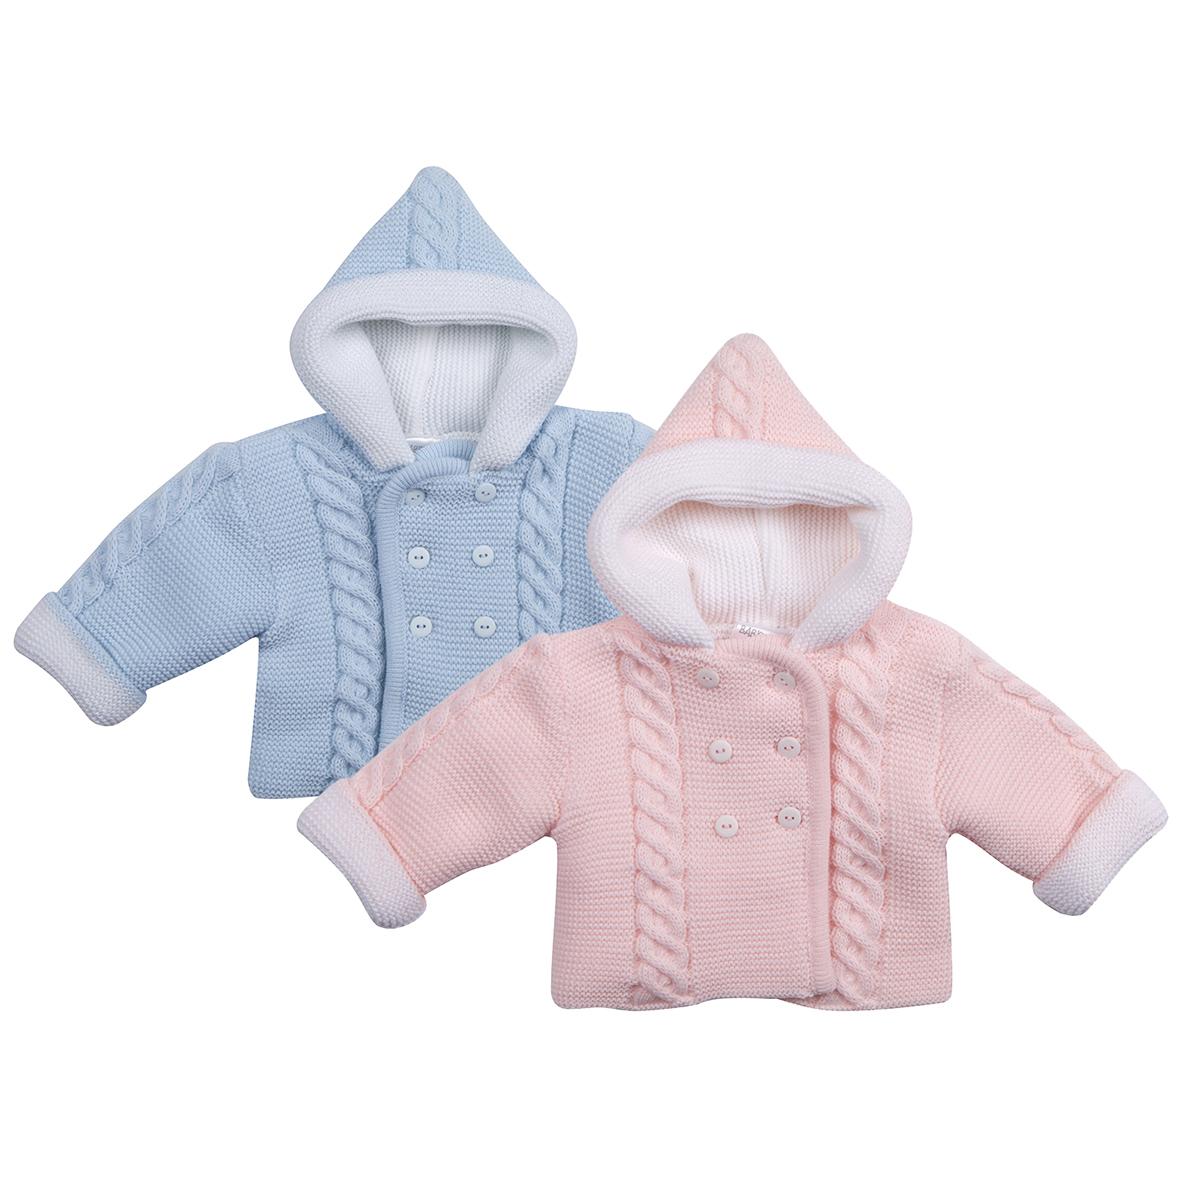 792ee0652aa0 Baby Babies Girls Boys Pram Coat Hooded Cardigan Chunky Knitted ...